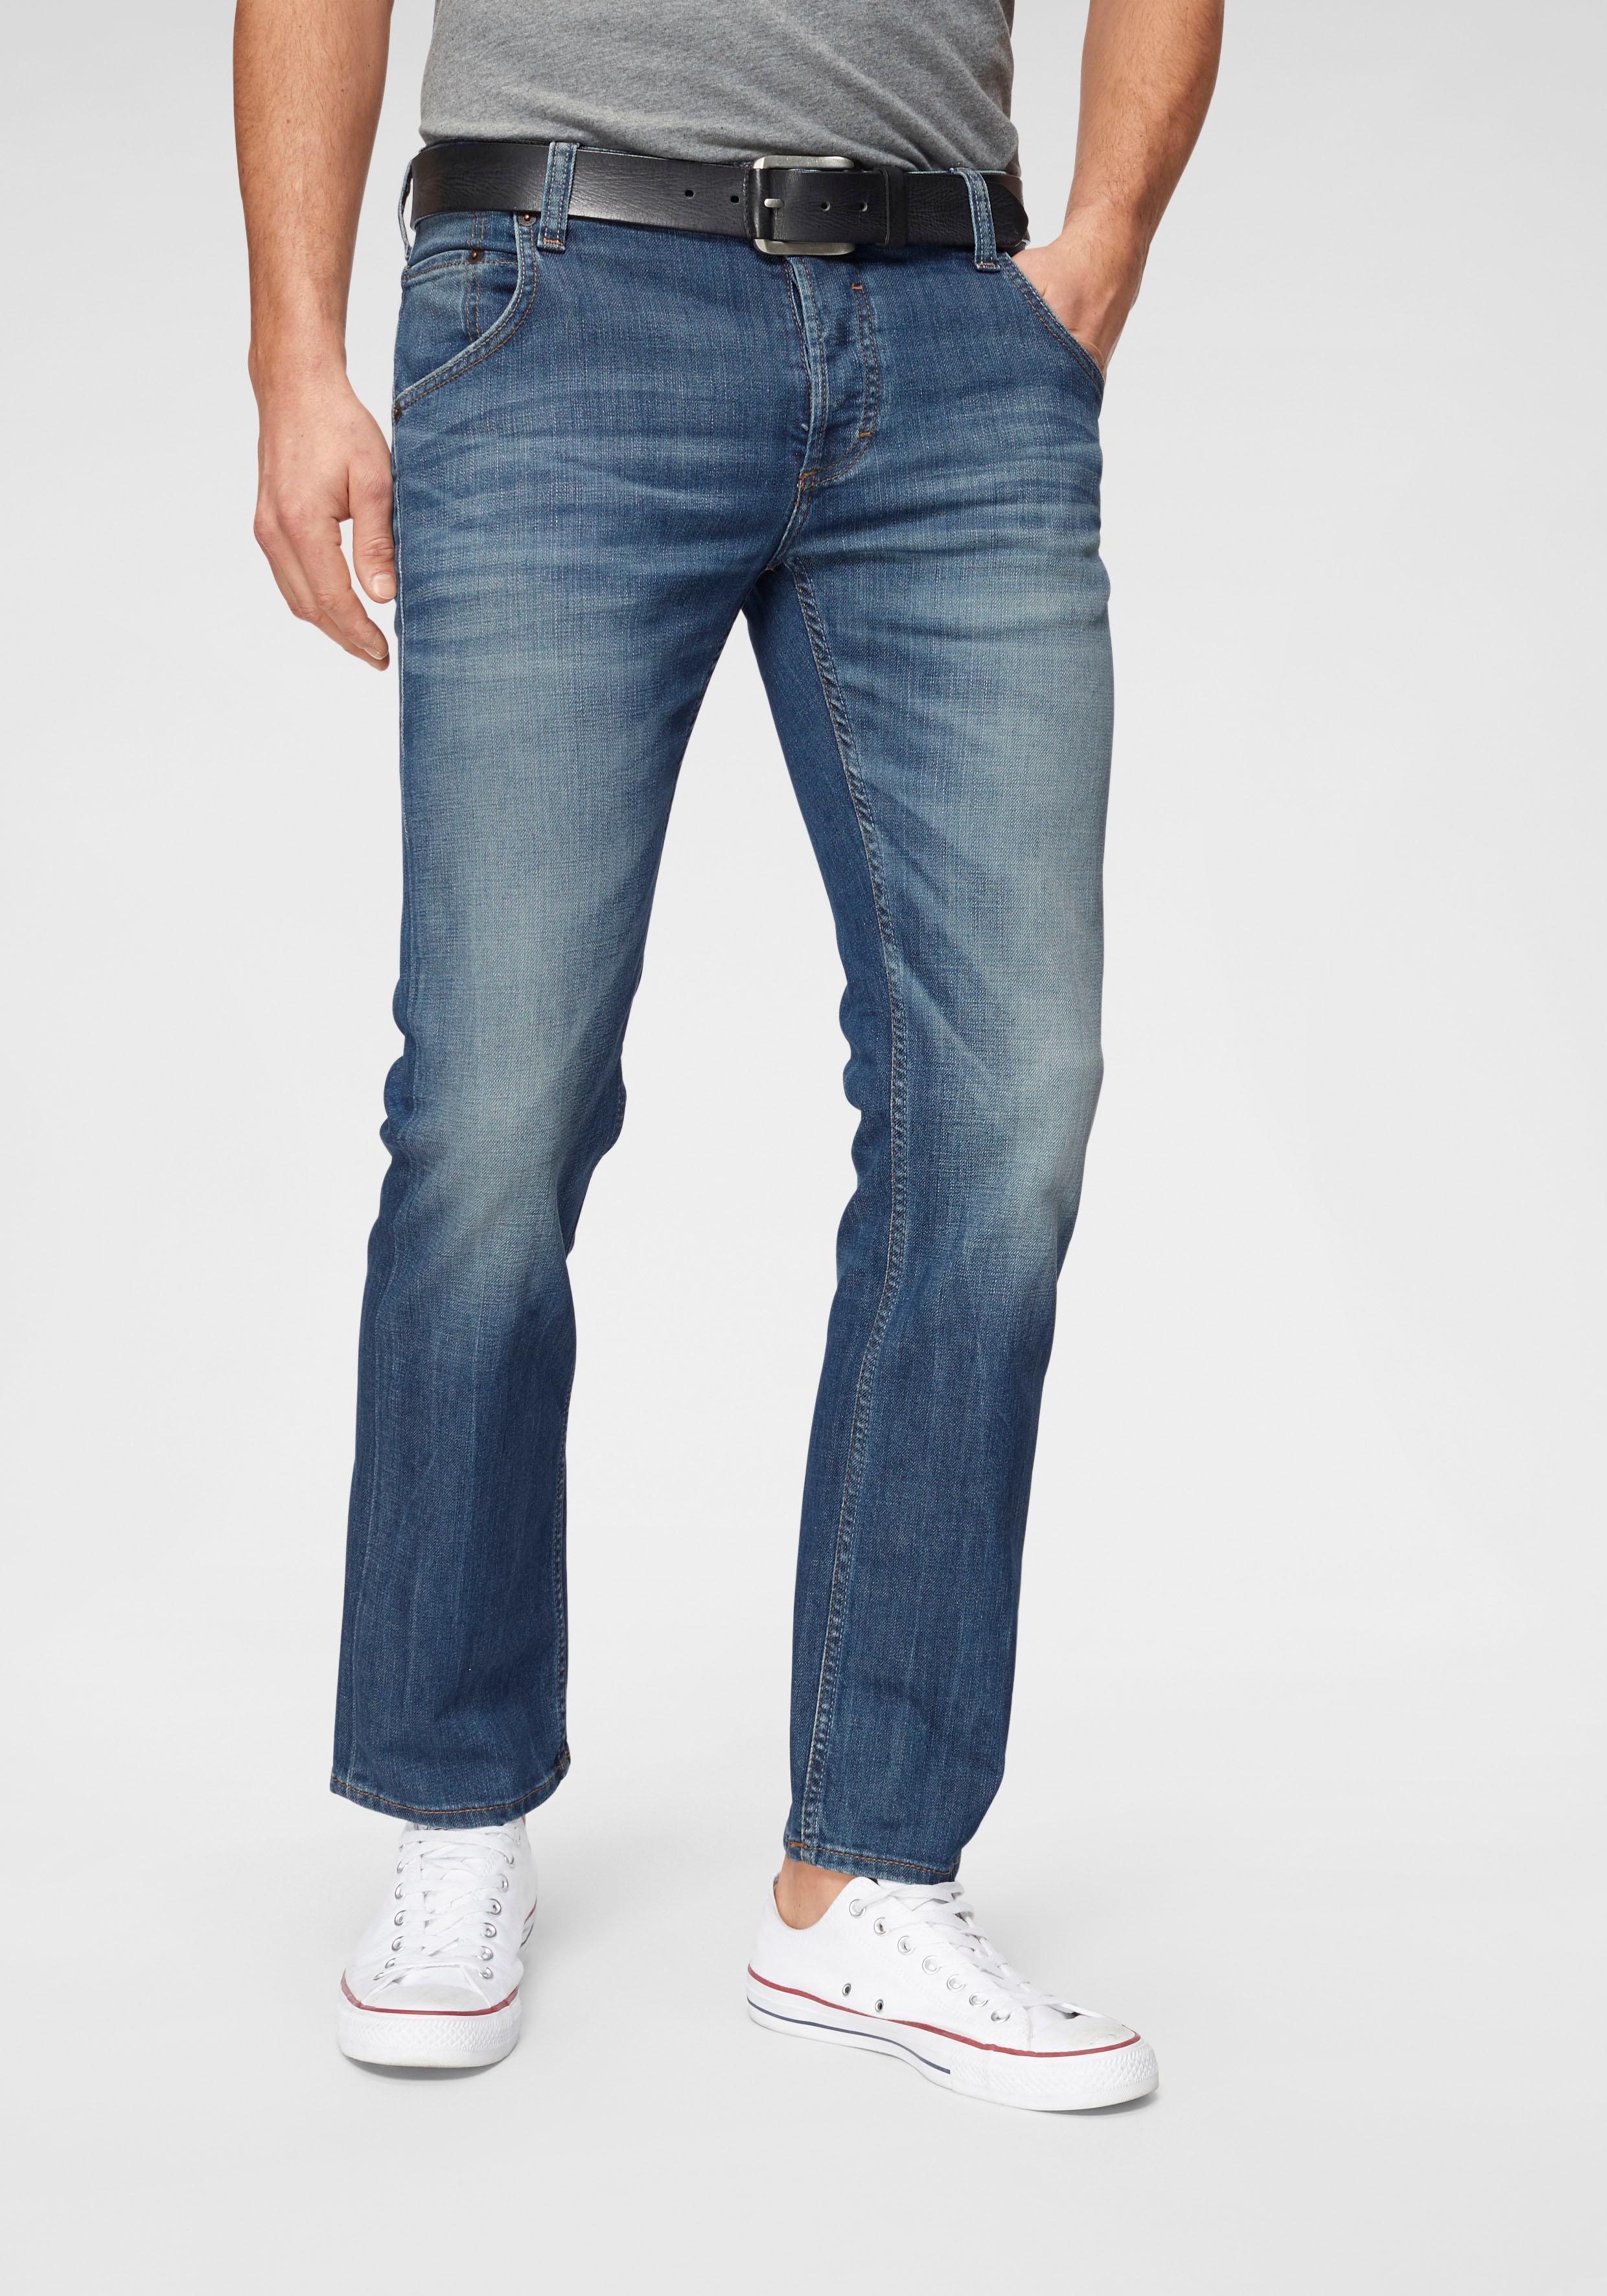 MUSTANG Slim-fit-Jeans MICHIGAN | Bekleidung > Jeans > Slim Fit Jeans | Blau | mustang